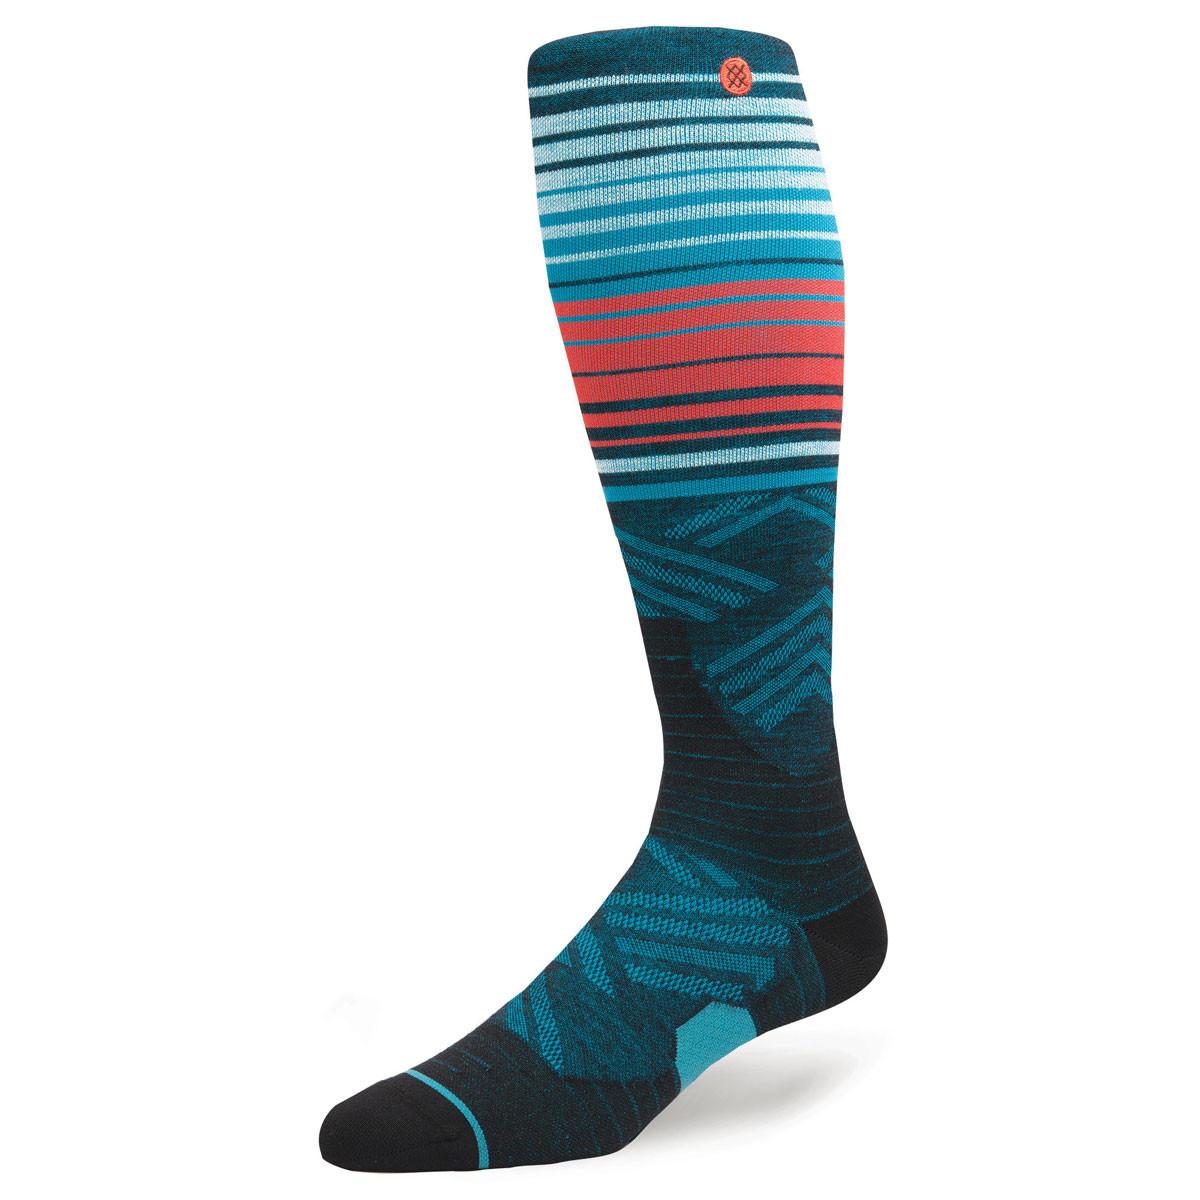 Stance Adios Ski Socks $34